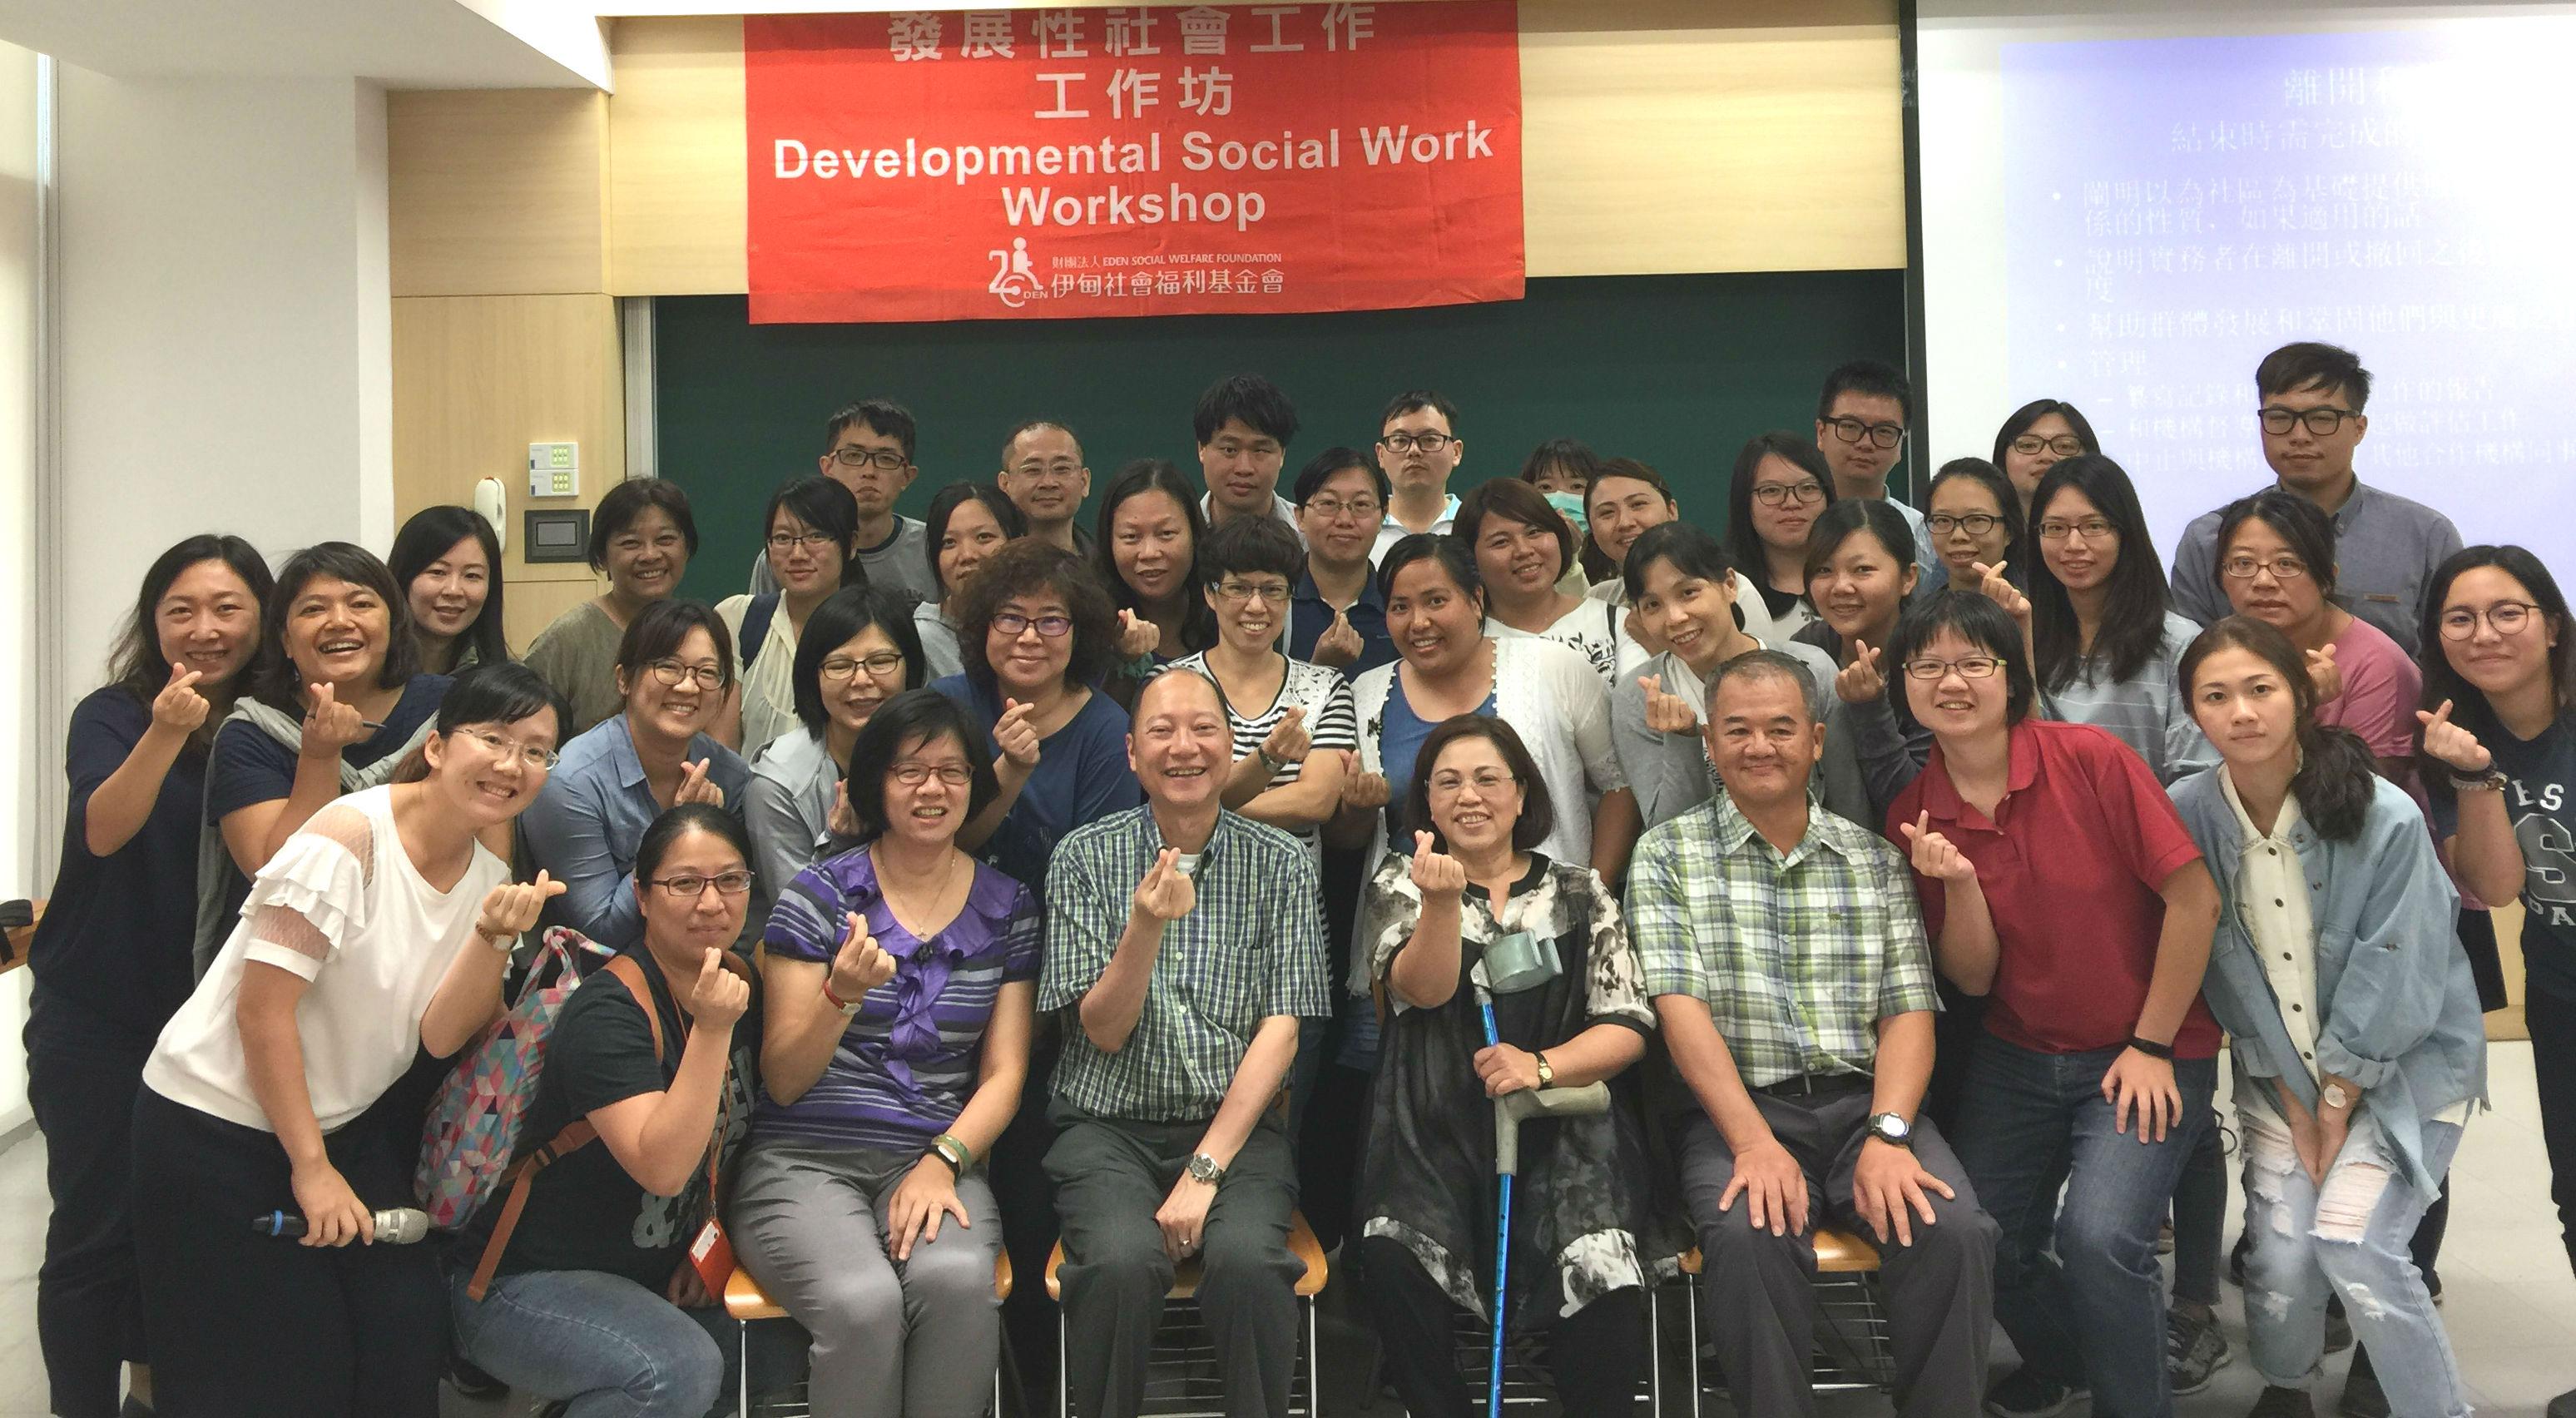 2017 Workshop on Developmental Social Work